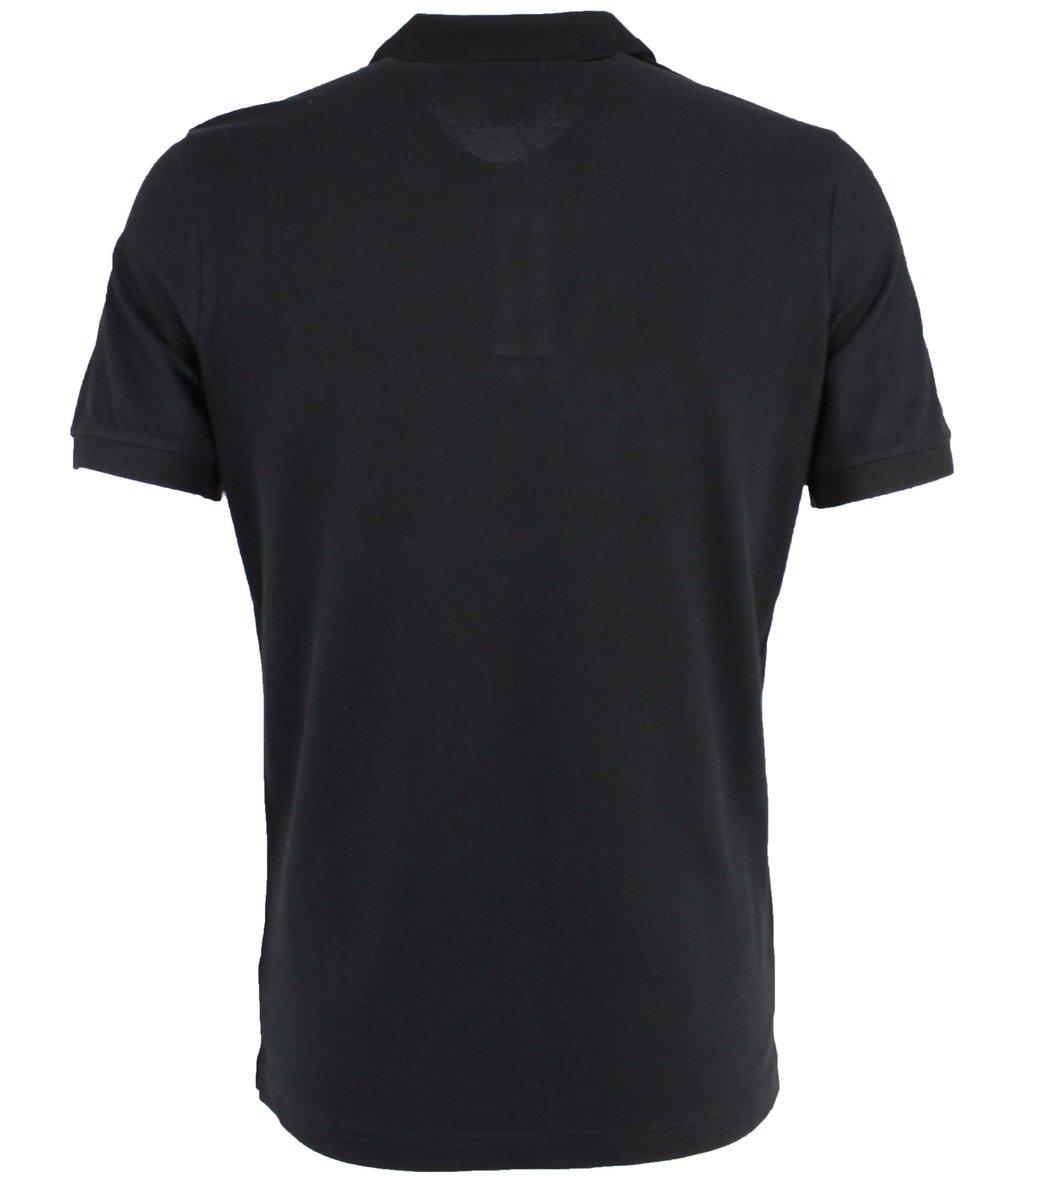 Черная футболка поло Hugo Boss MH2